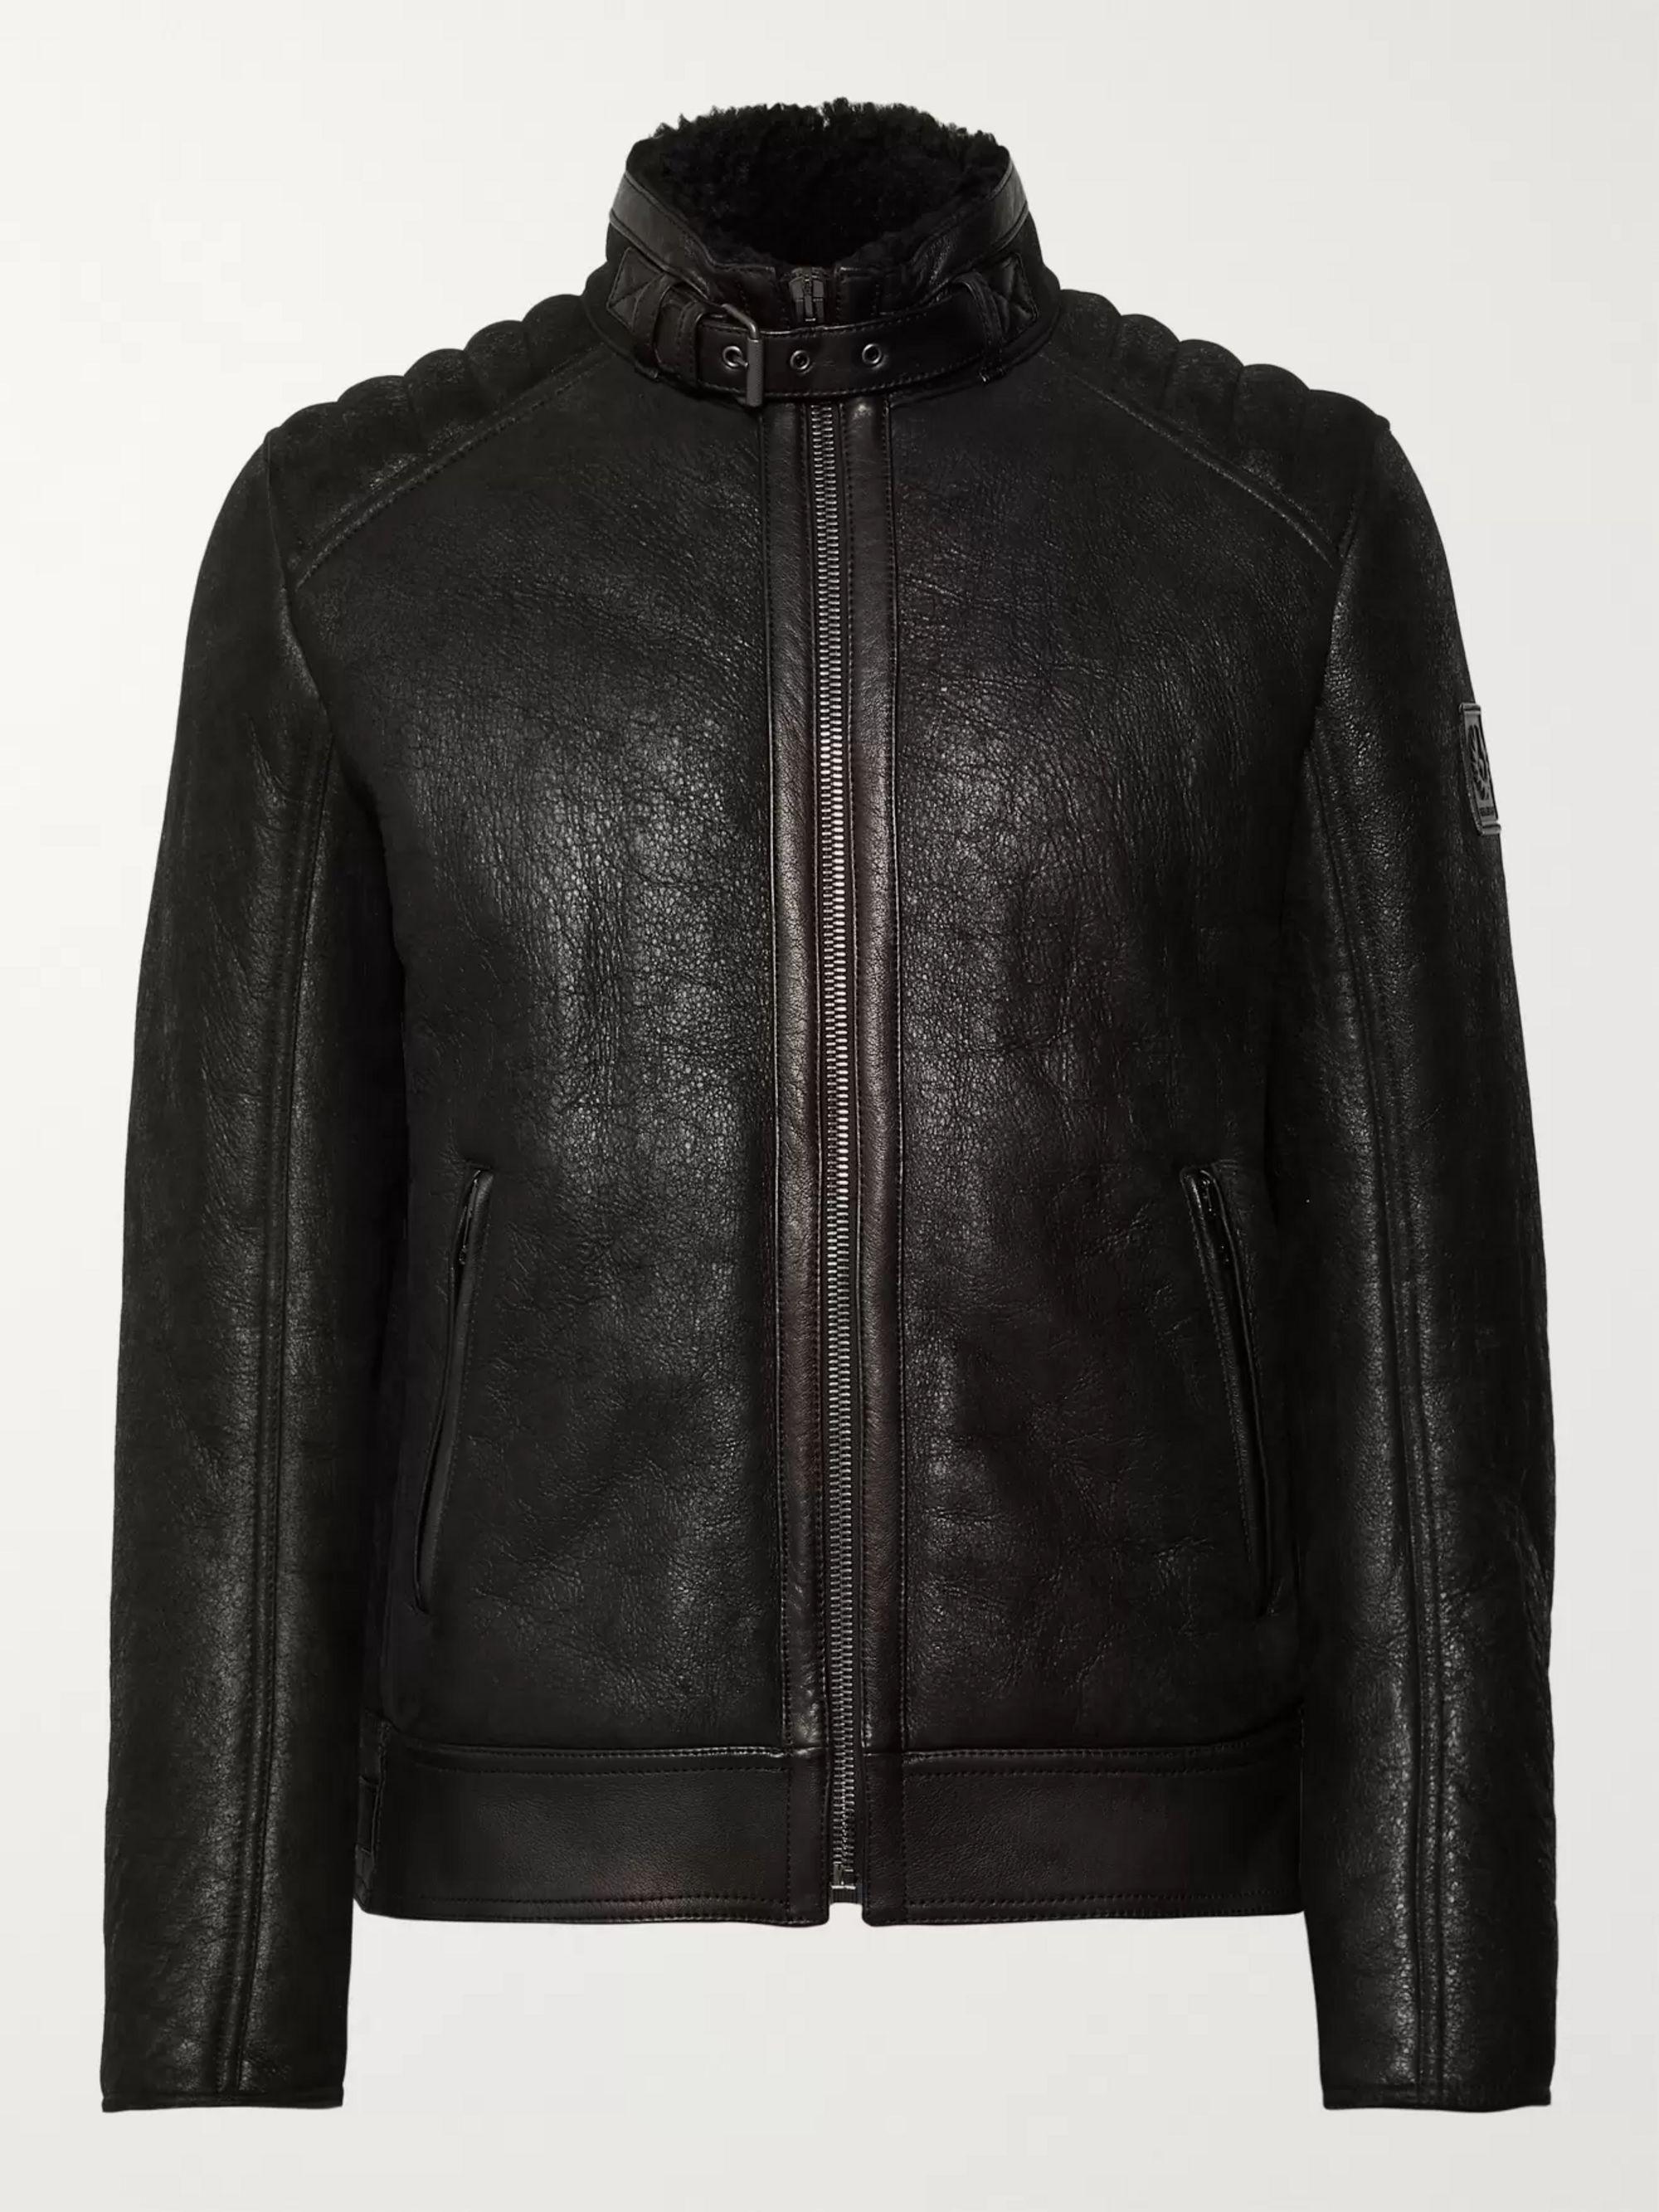 price reduced reasonably priced outlet online Westlake 2.0 Slim-Fit Leather-Trimmed Shearling Biker Jacket